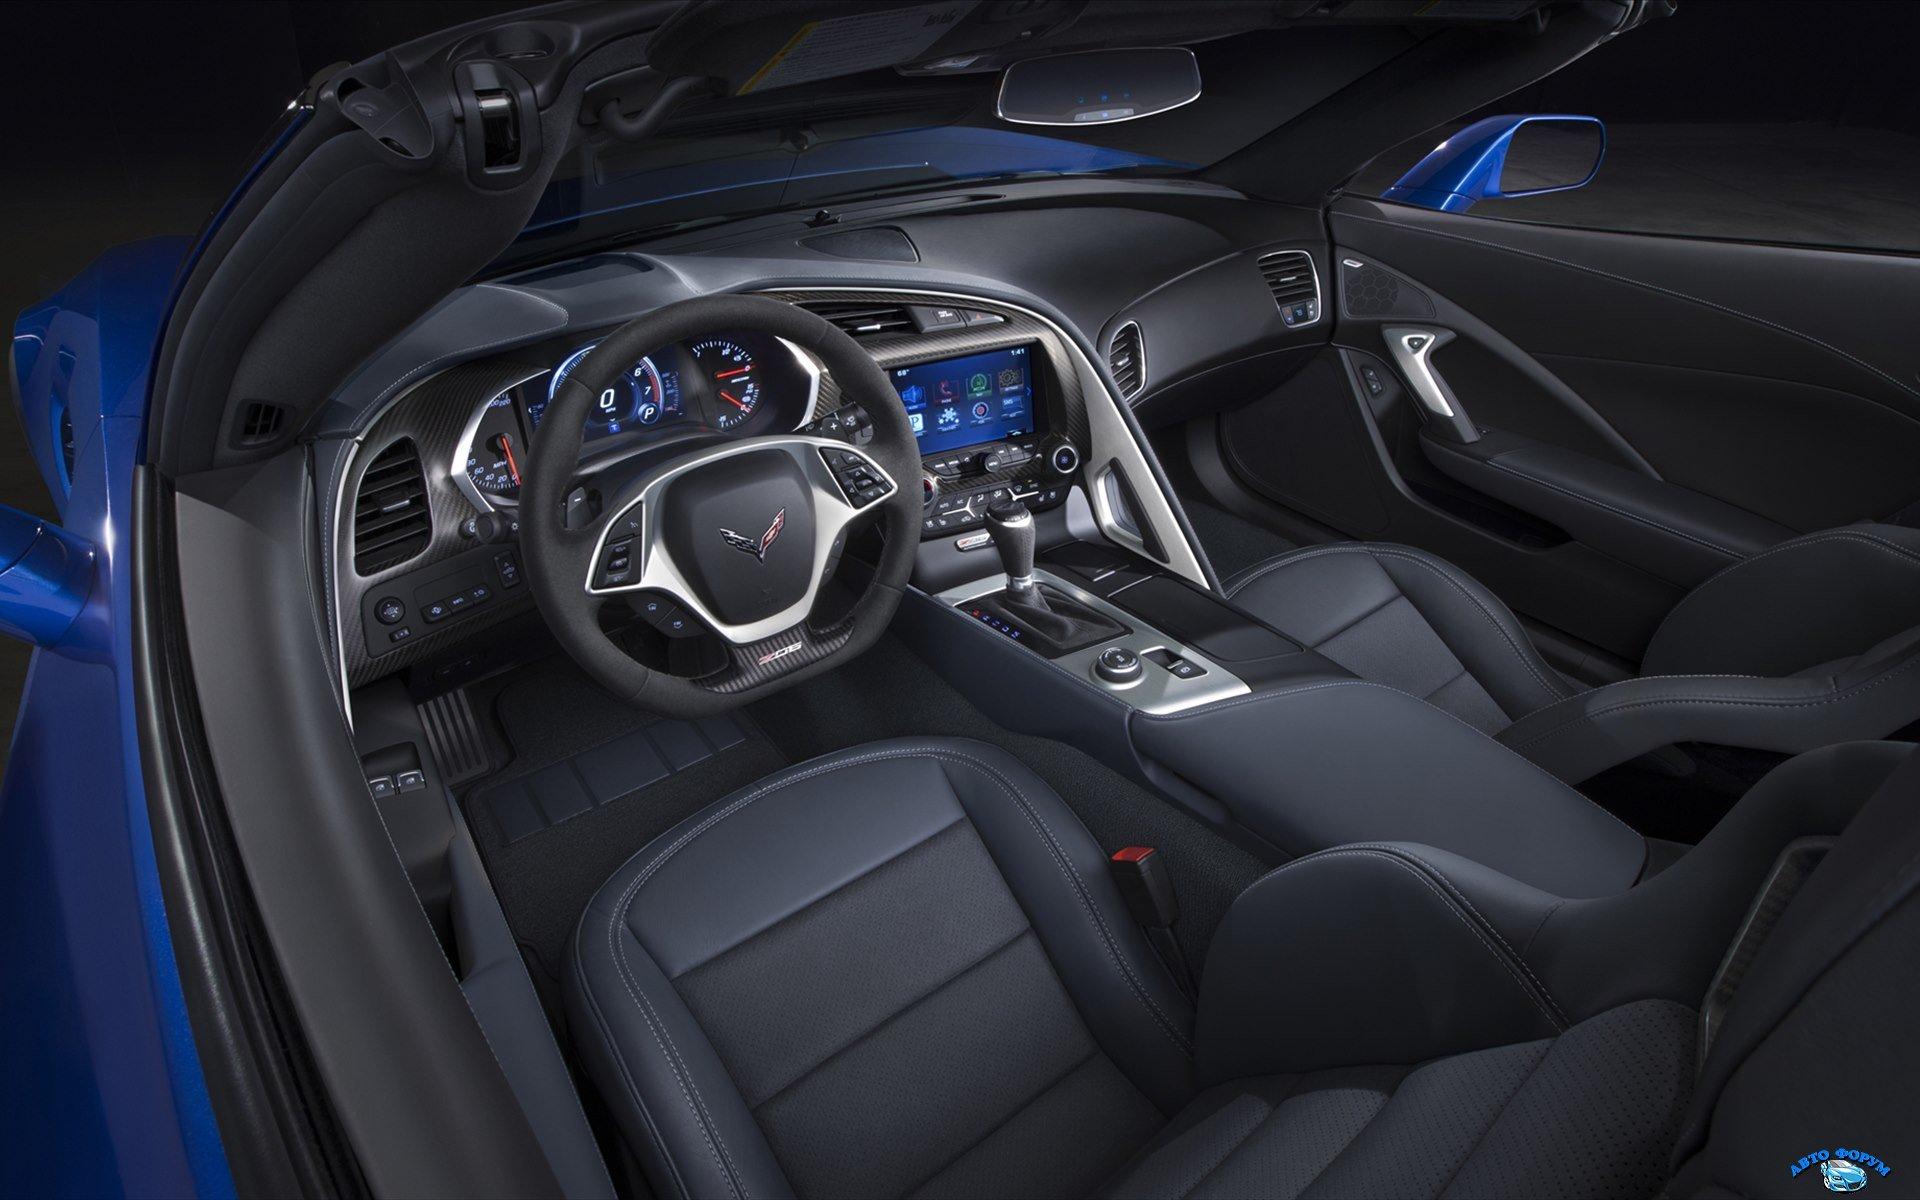 Chevrolet-Corvette-Z06-Convertible-2015-widescreen-14.jpg